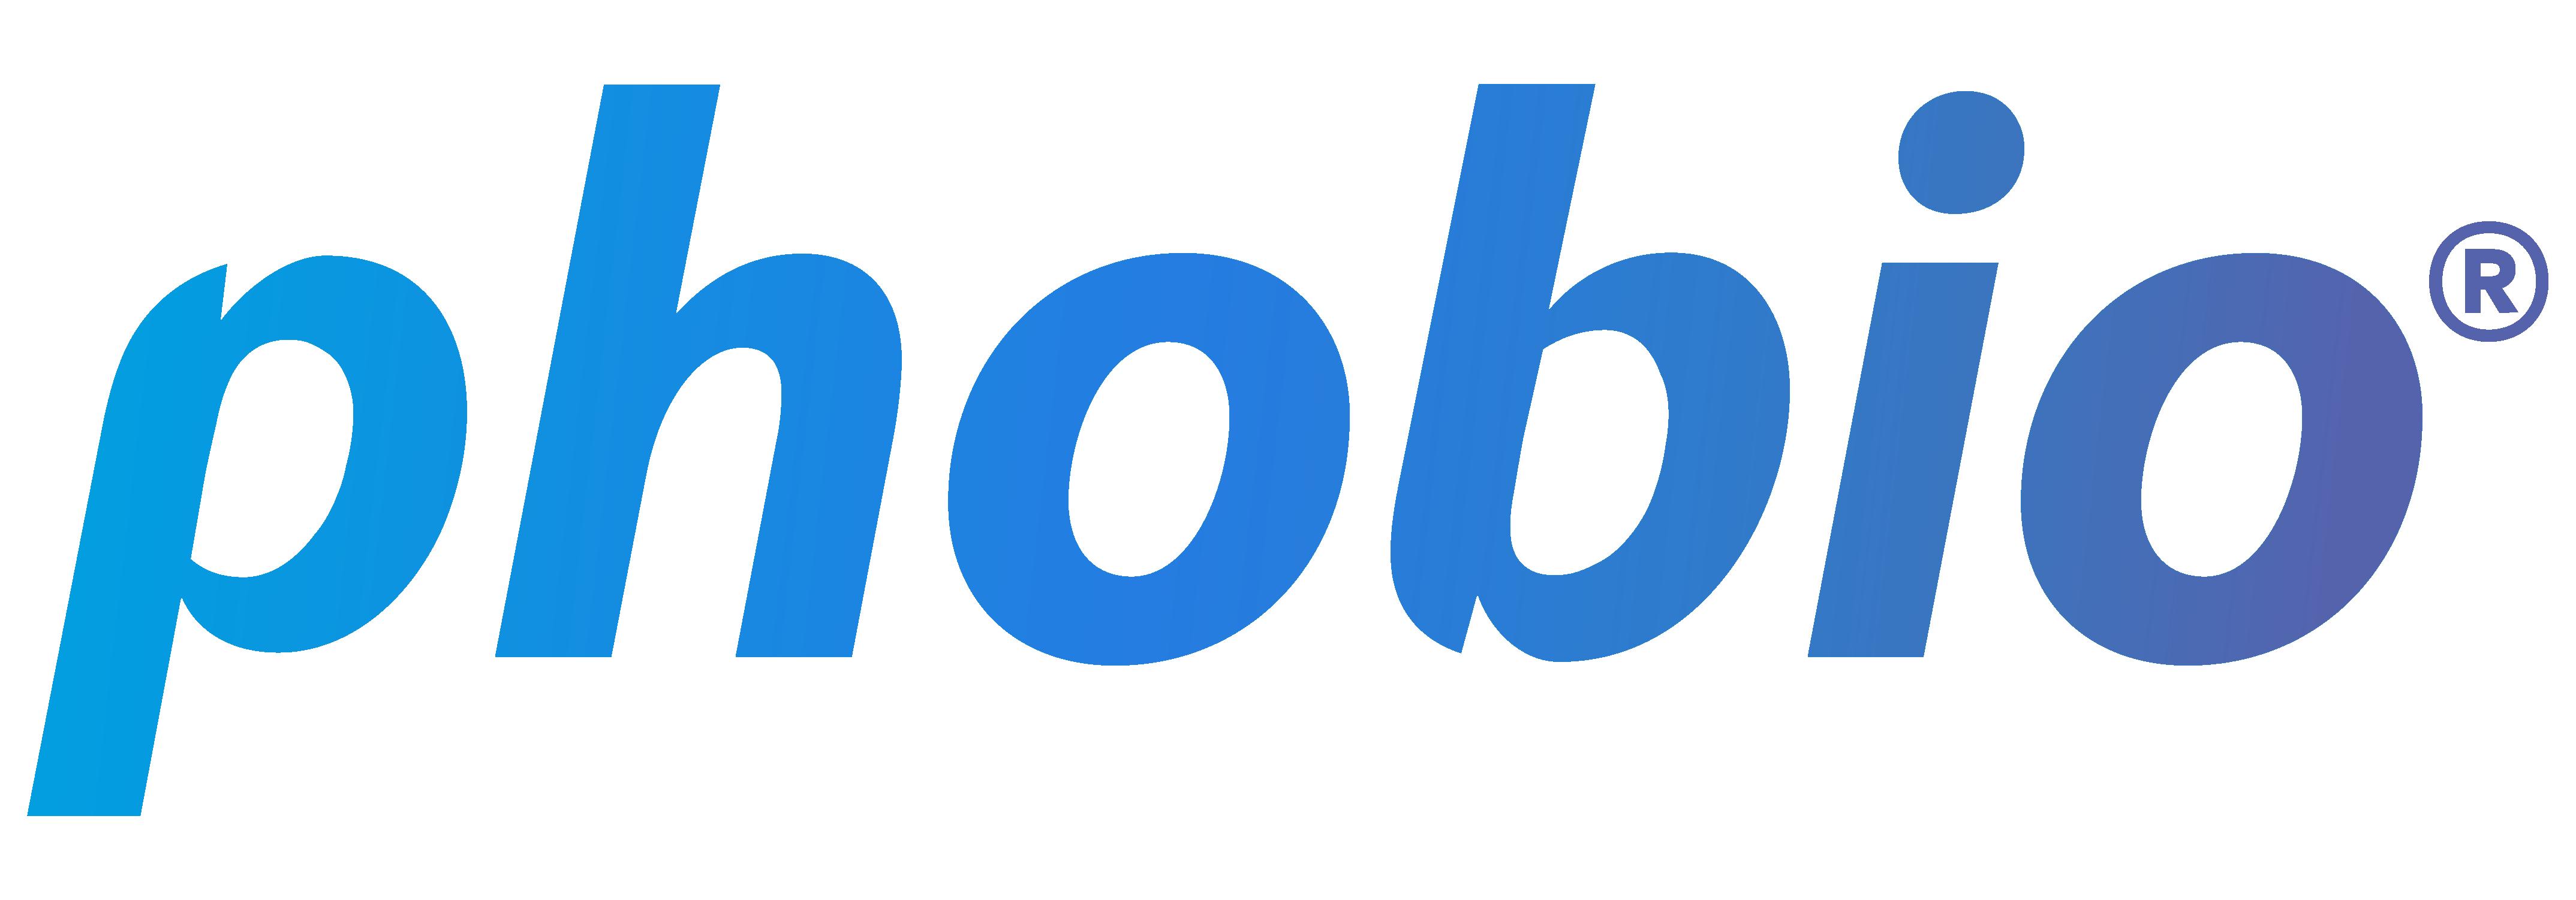 Phobio, LLC Company Logo